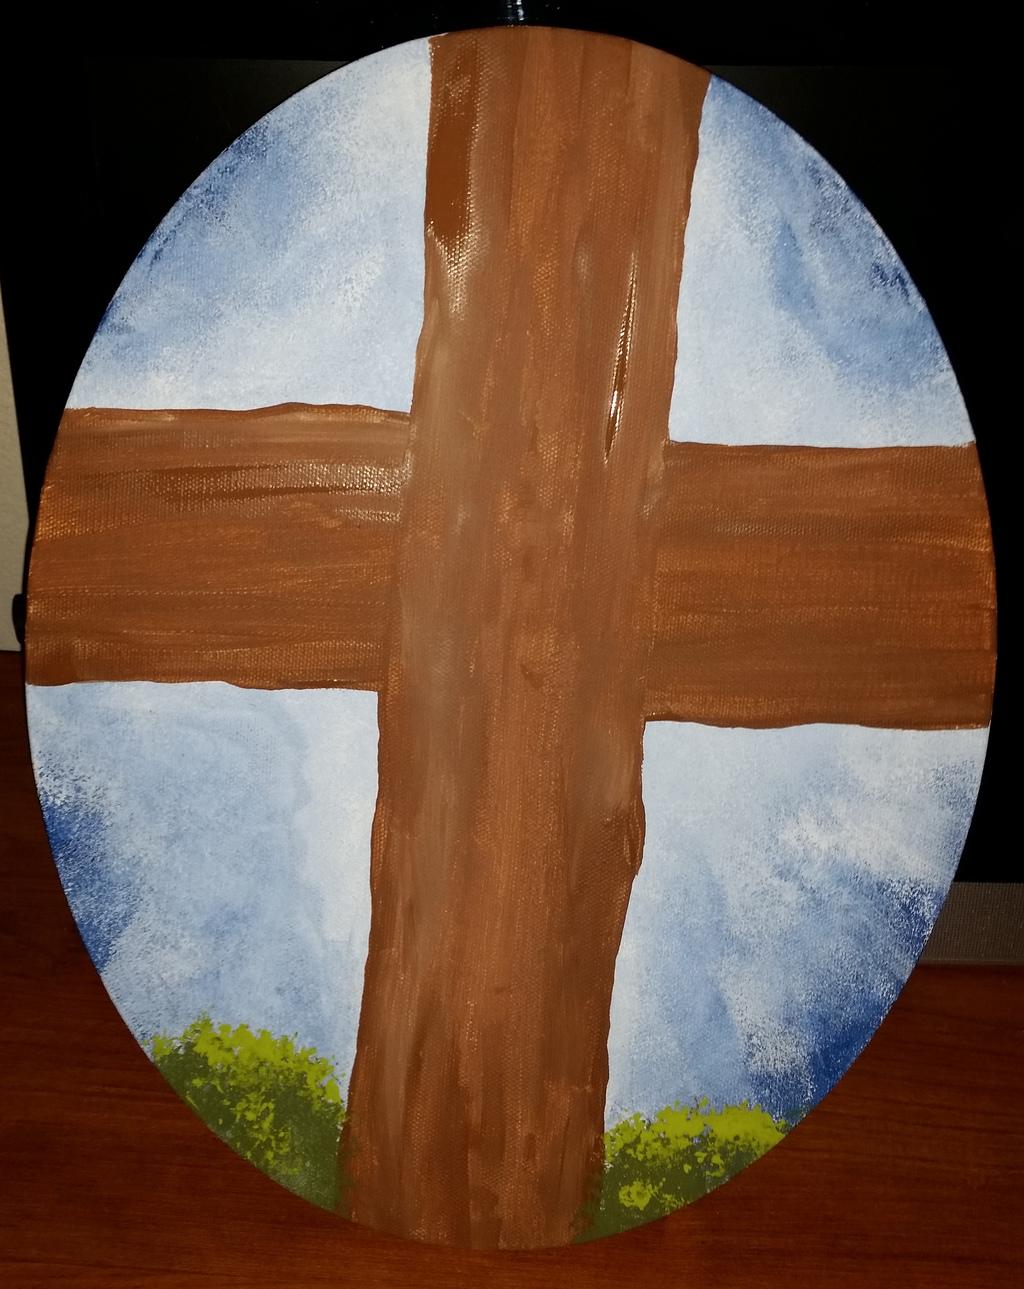 WiP: Cross of Christ